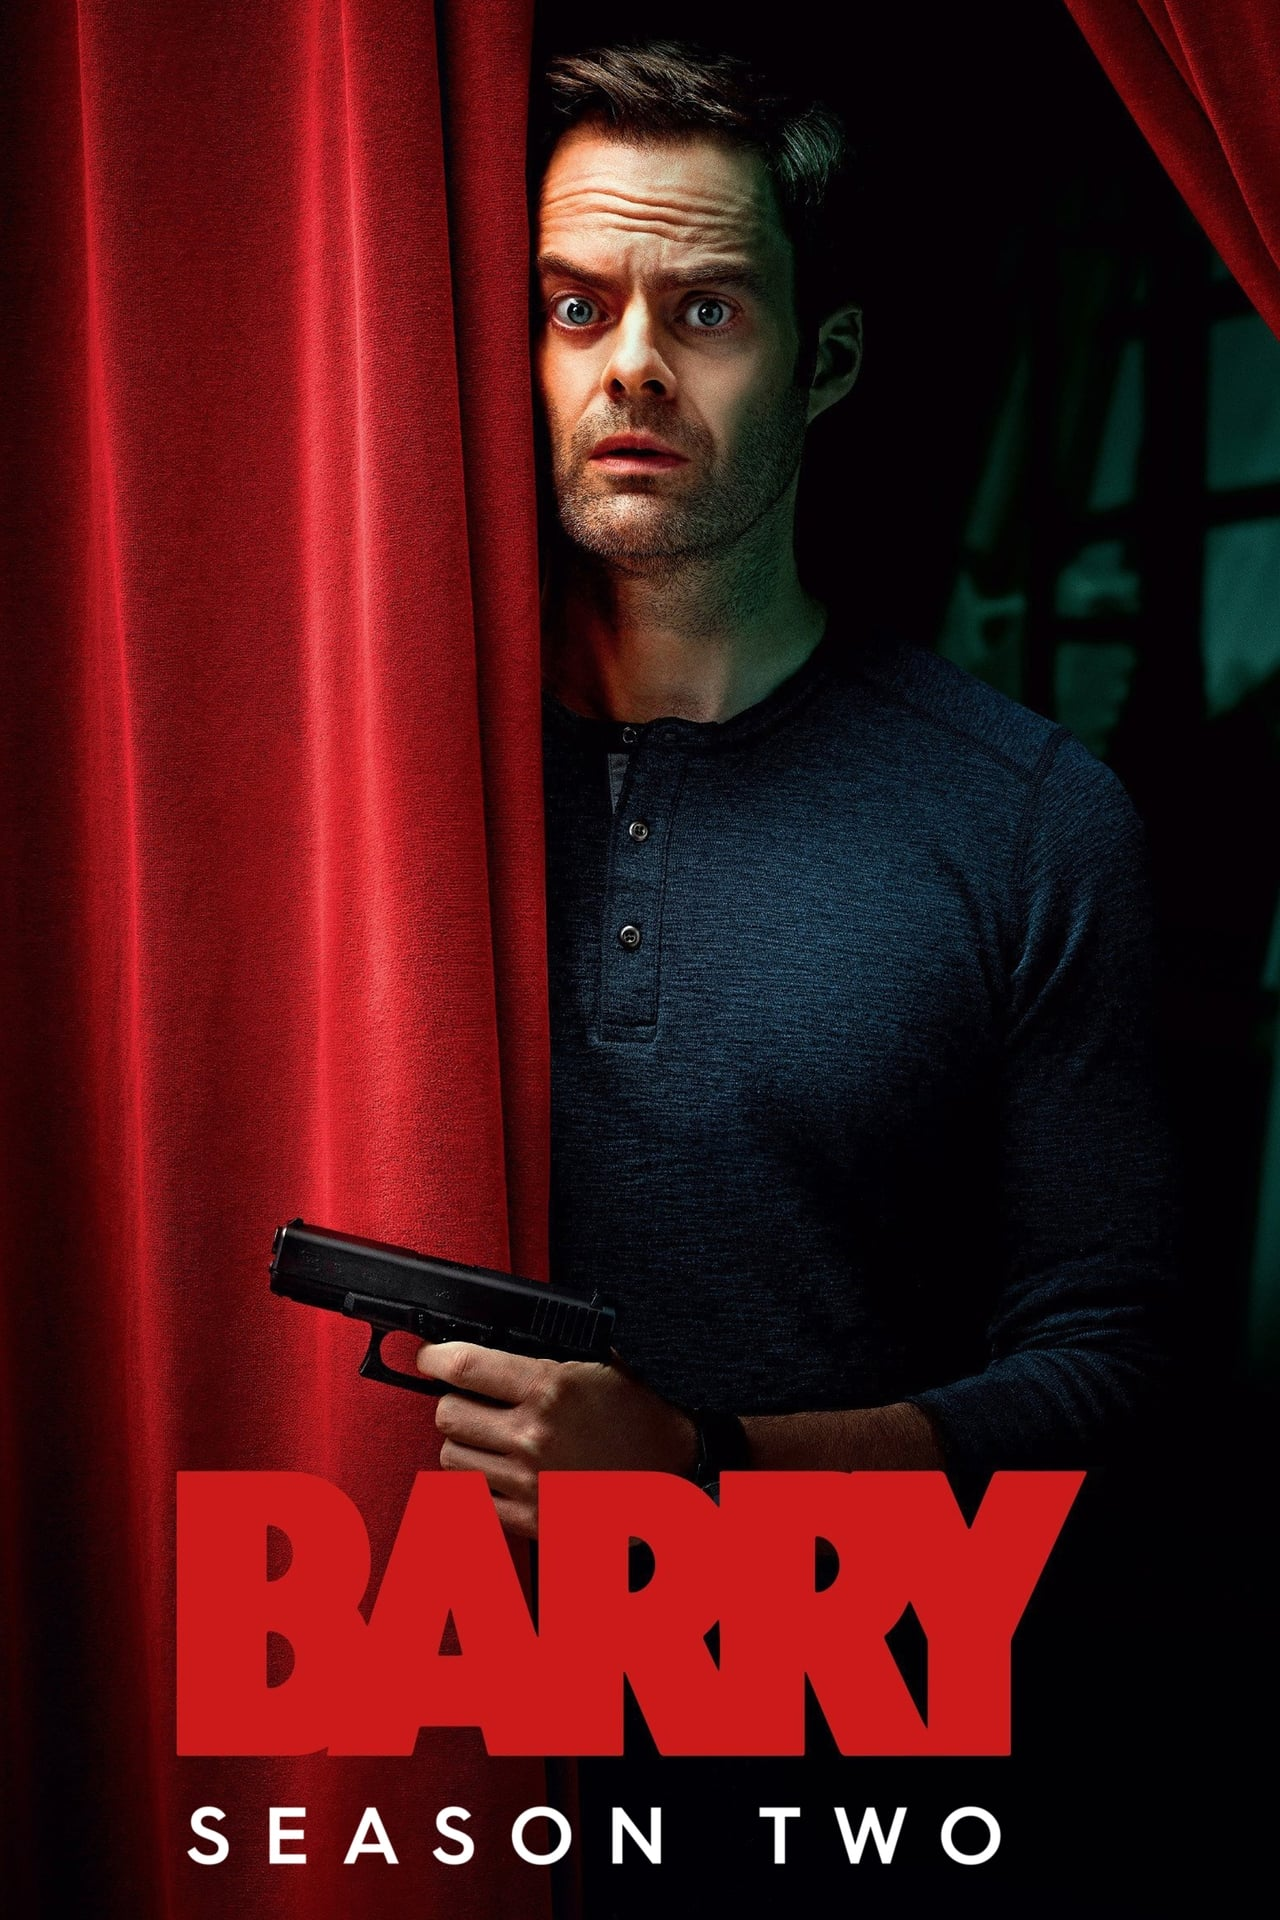 Barry Season 2 image